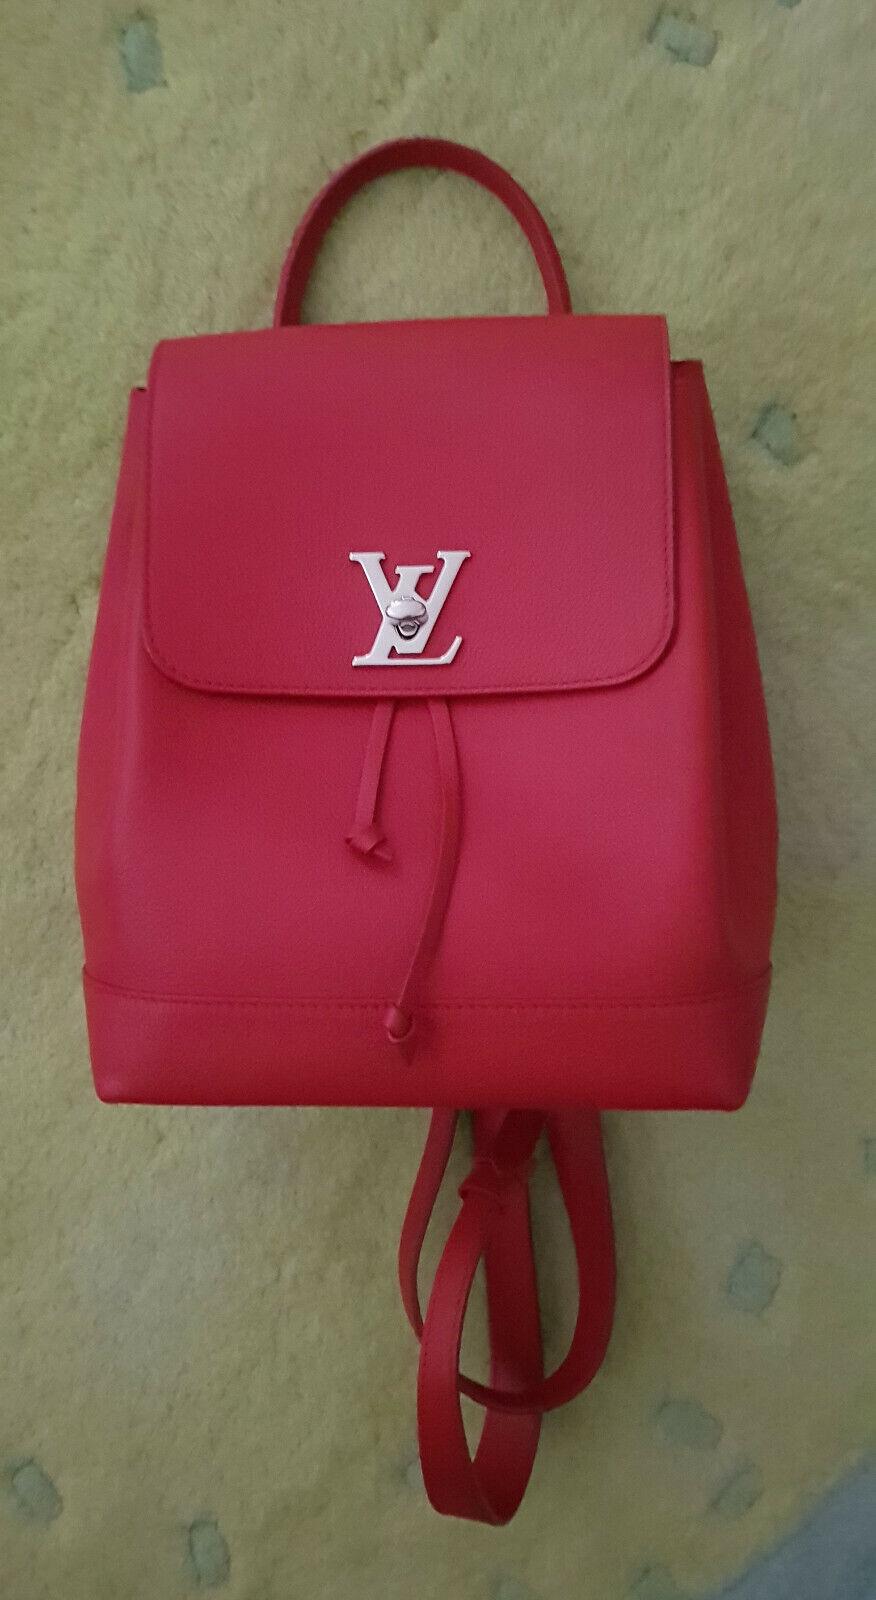 Louis Vuitton Lockme Backpack - image 1